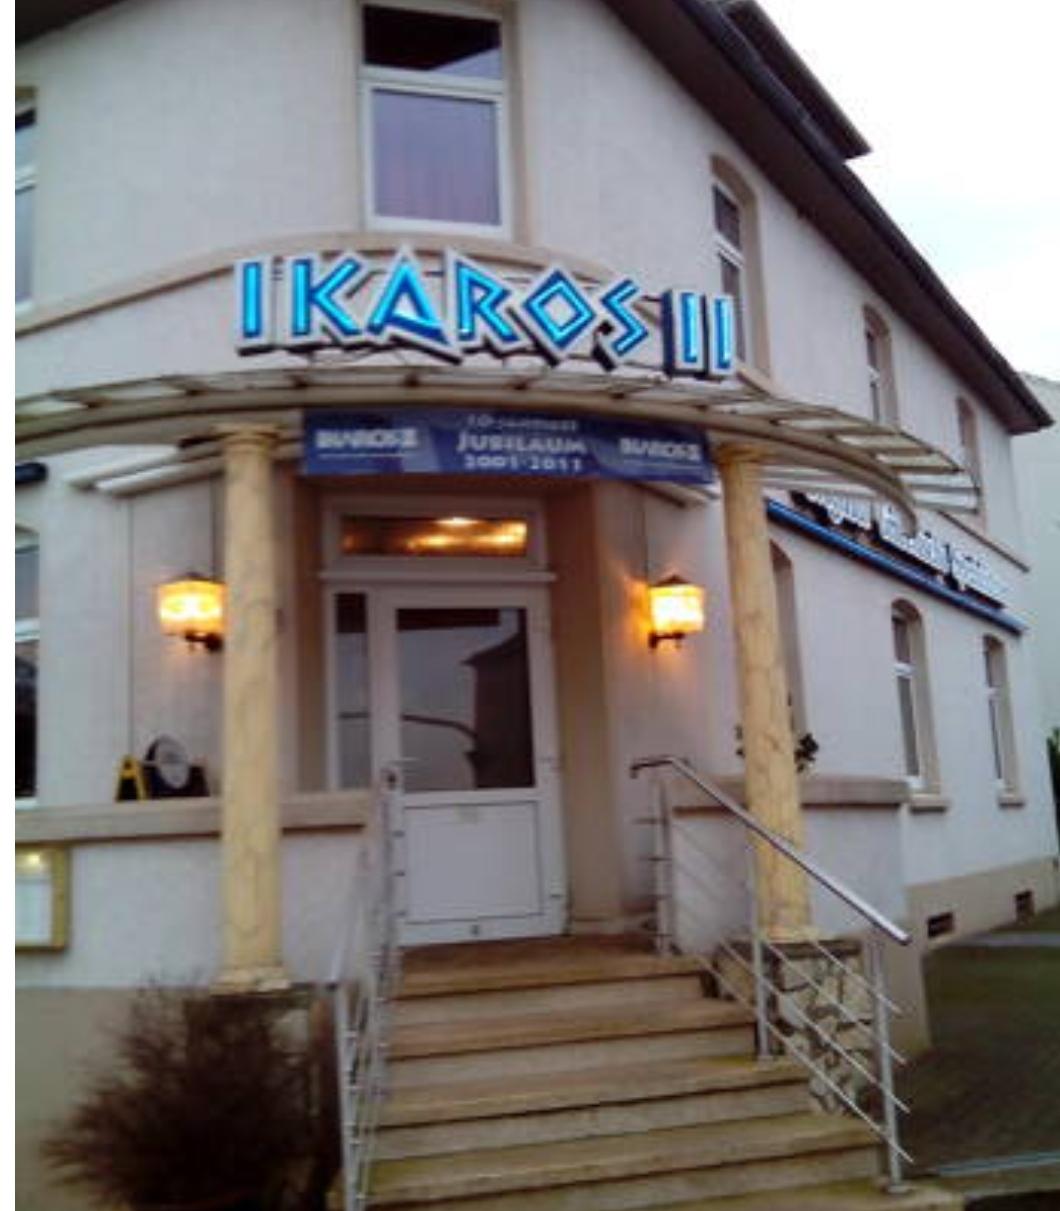 Ikaros II